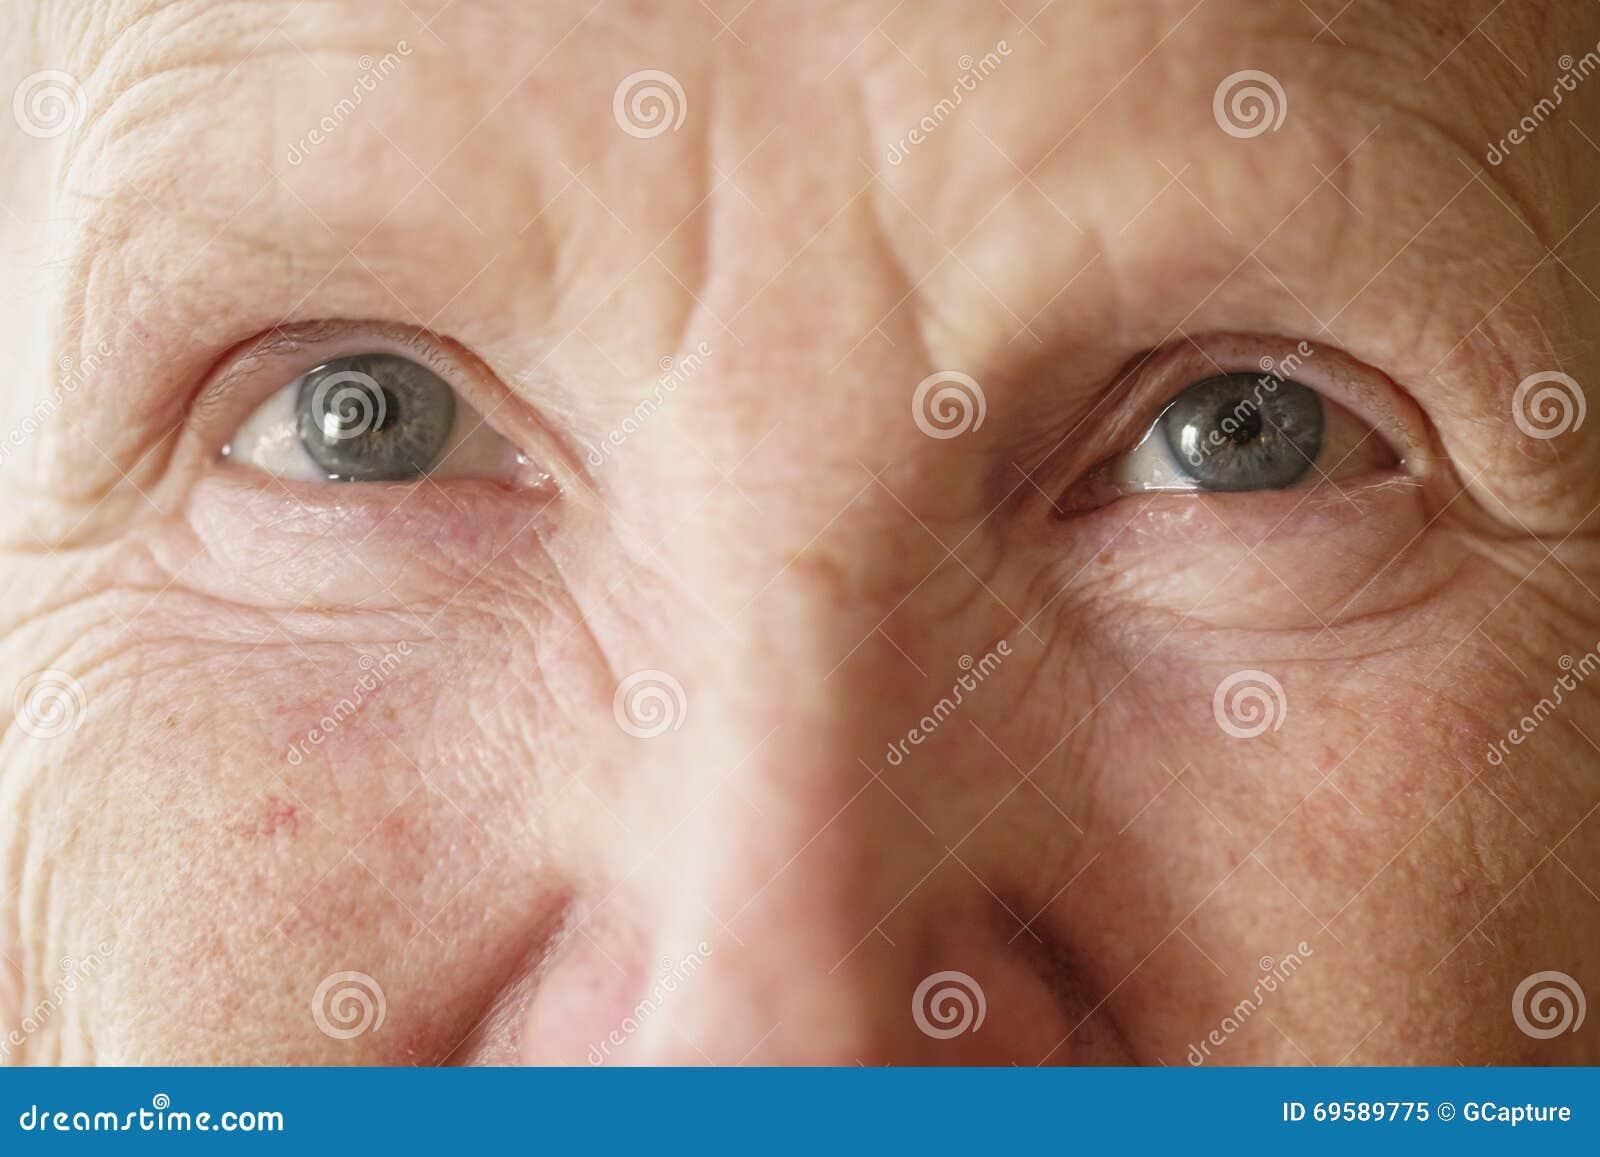 Senior woman grandma eyes looking to camera close up portrait